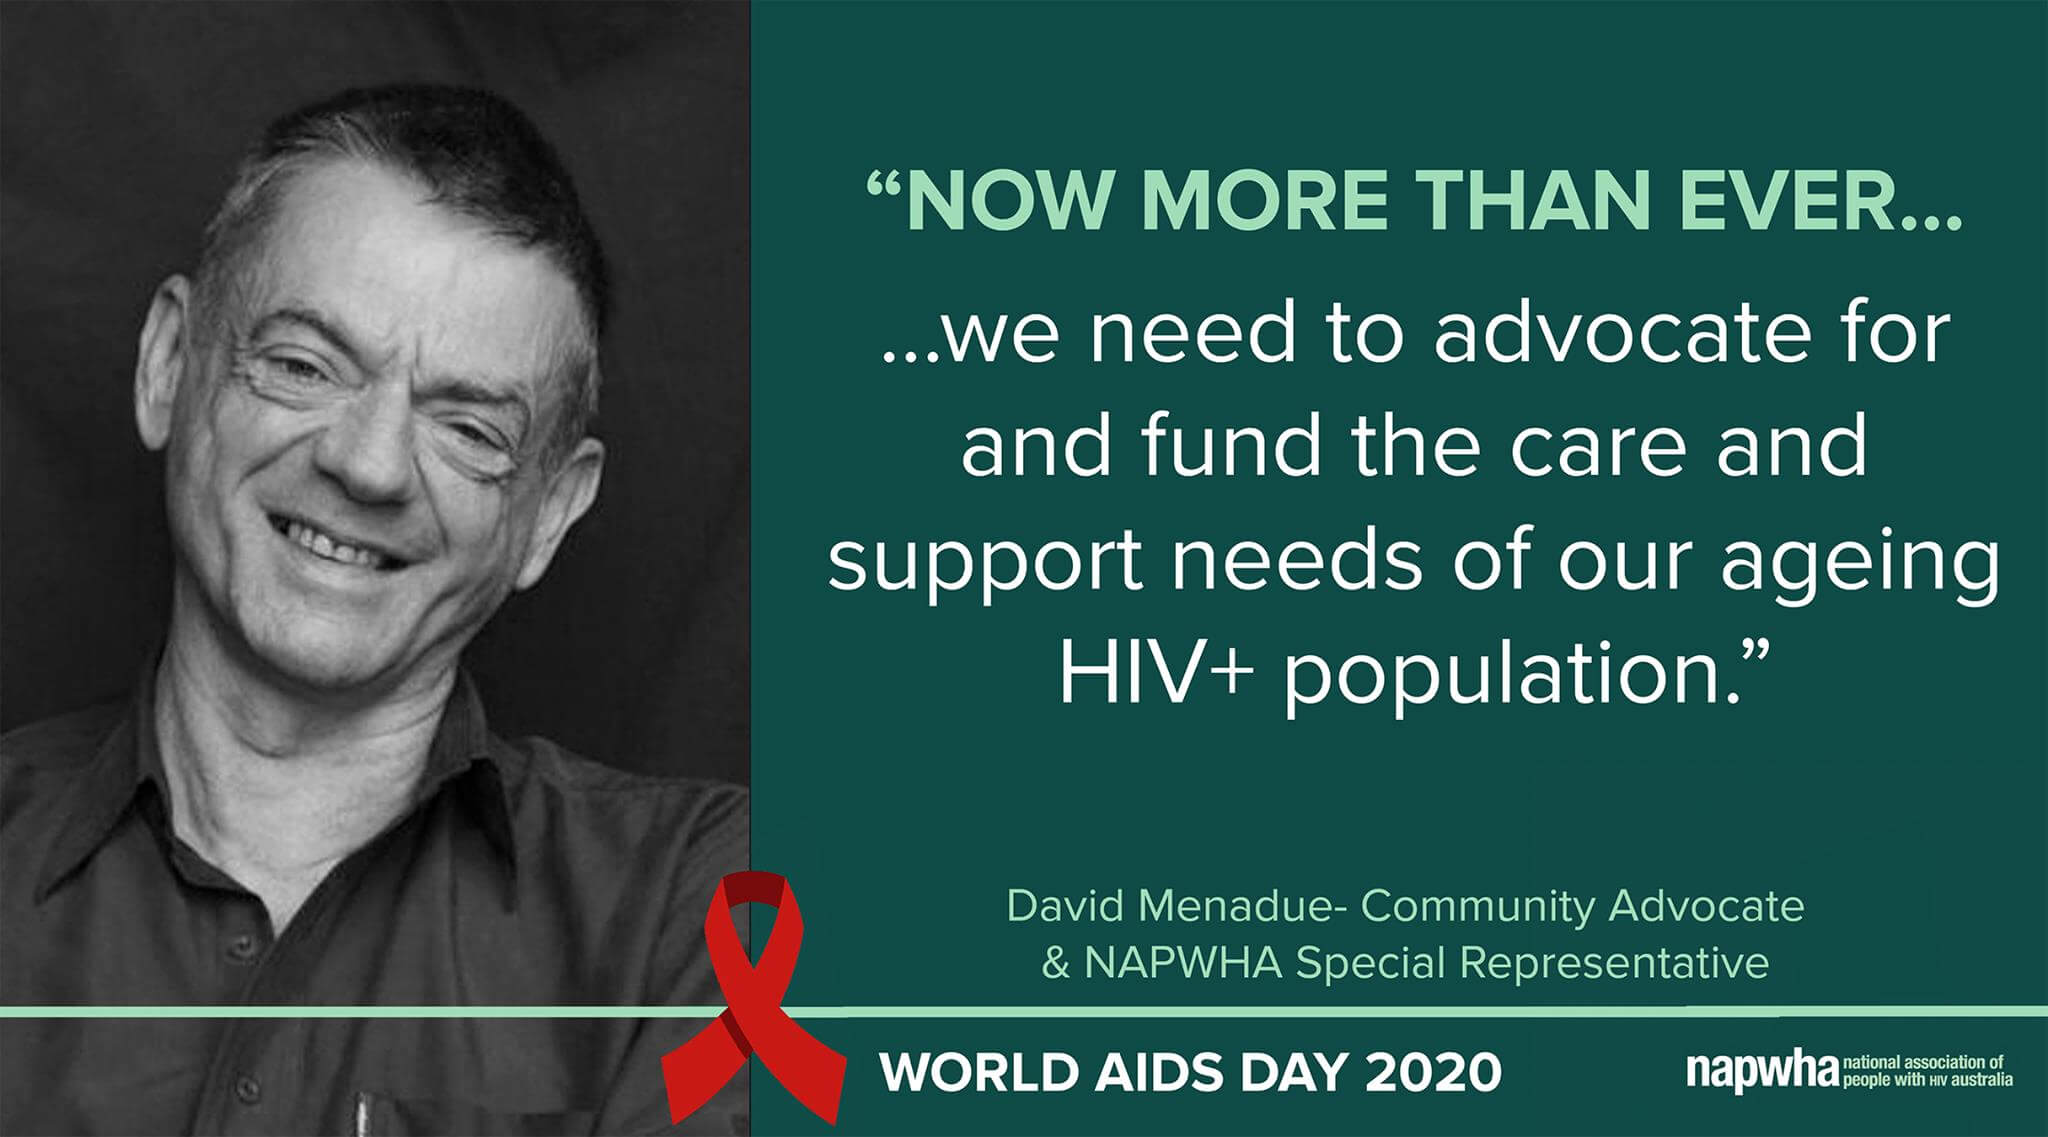 David Menadue, Community Advocate and NAPWHA Board Secretary-Treasurer provides a World AIDS Day 2020 message